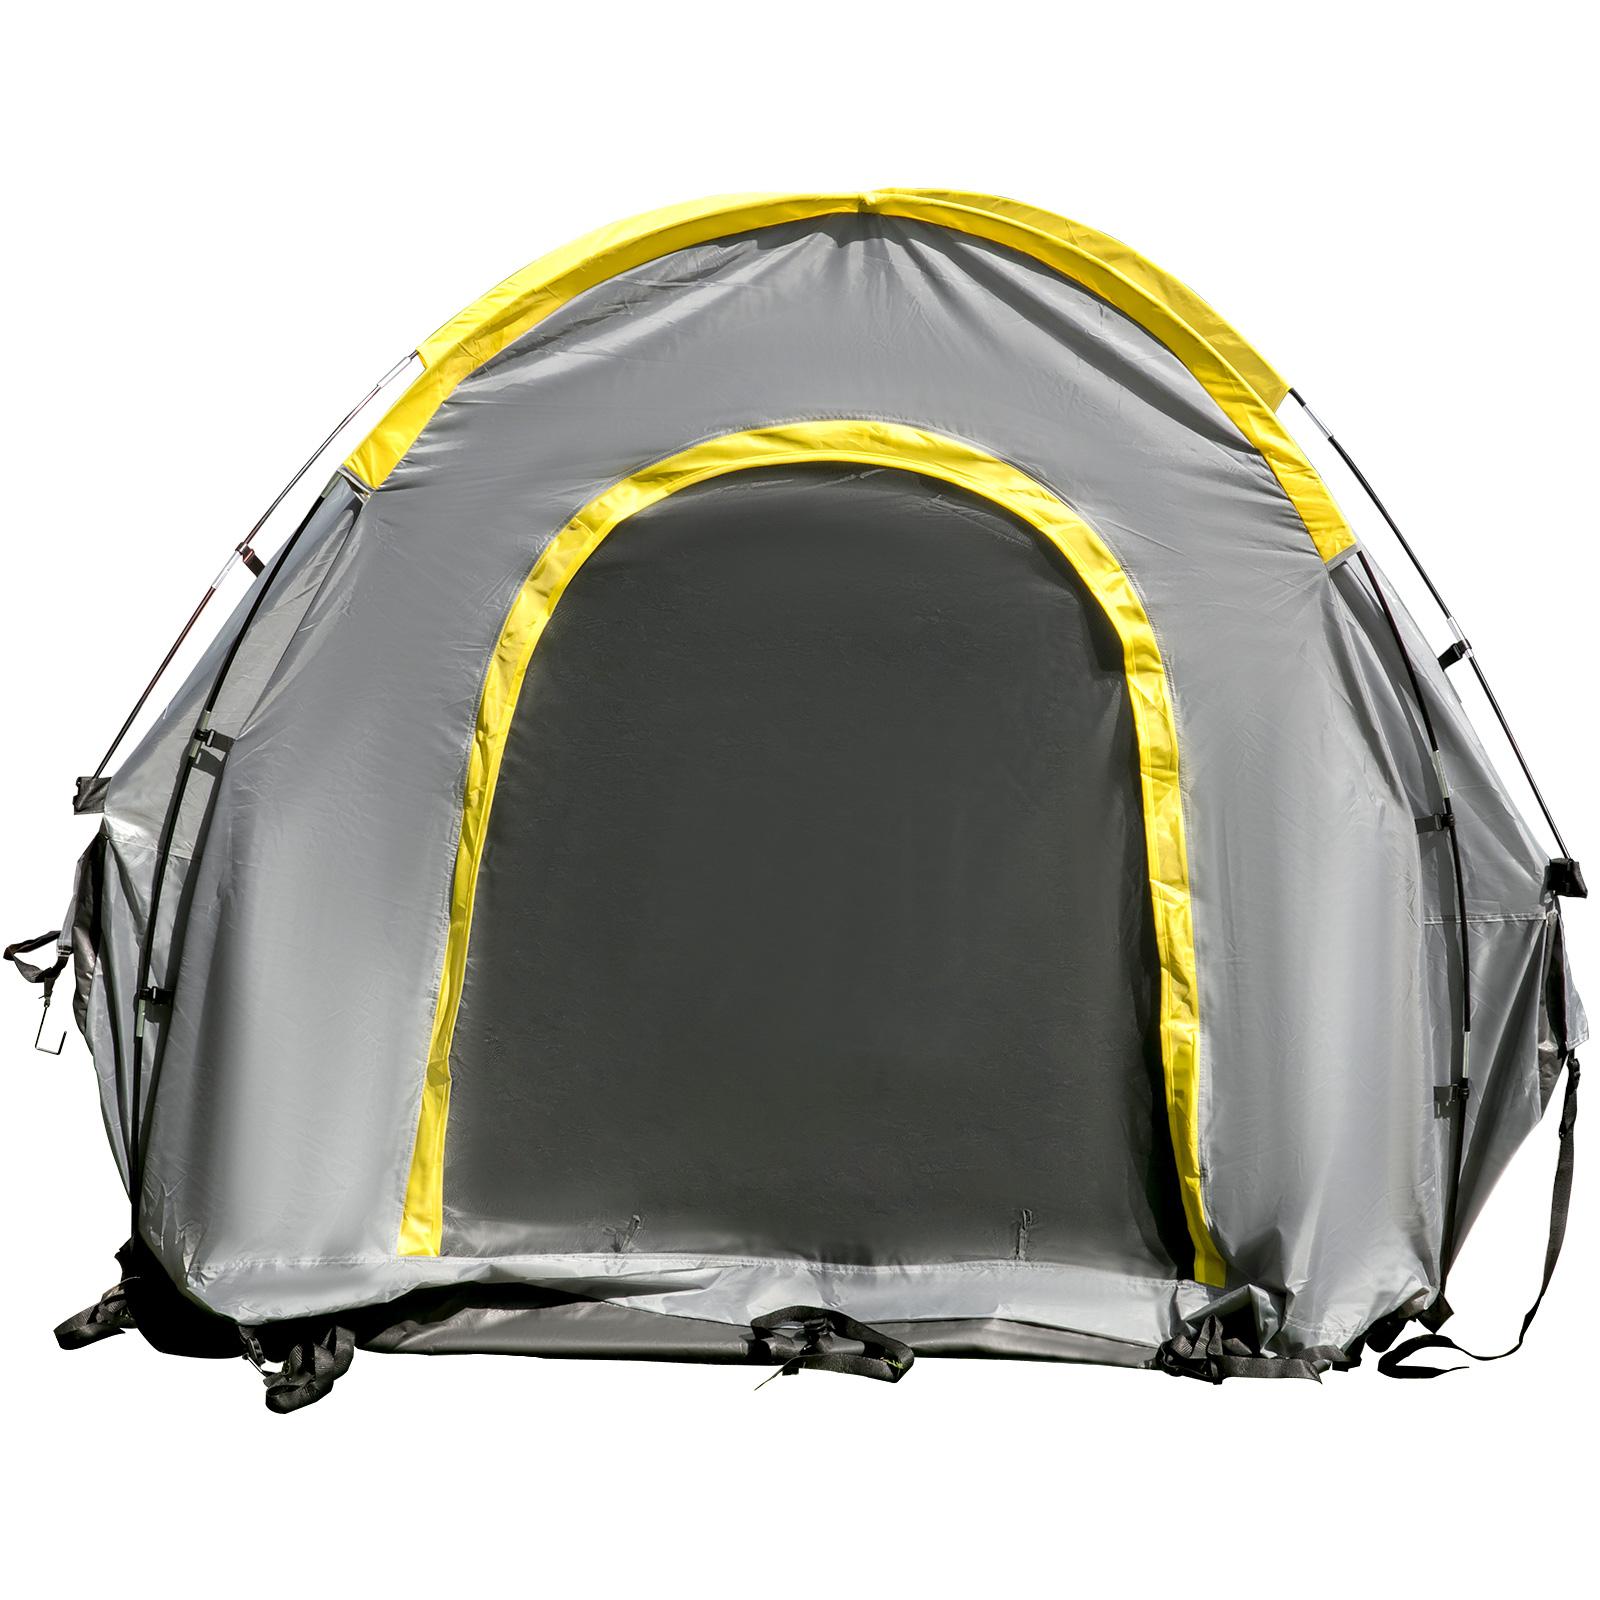 thumbnail 25 - VEVOR Truck Tent Truck Bed Tent 5' - 8' Pickup Tent Waterproof Outdoor Camping